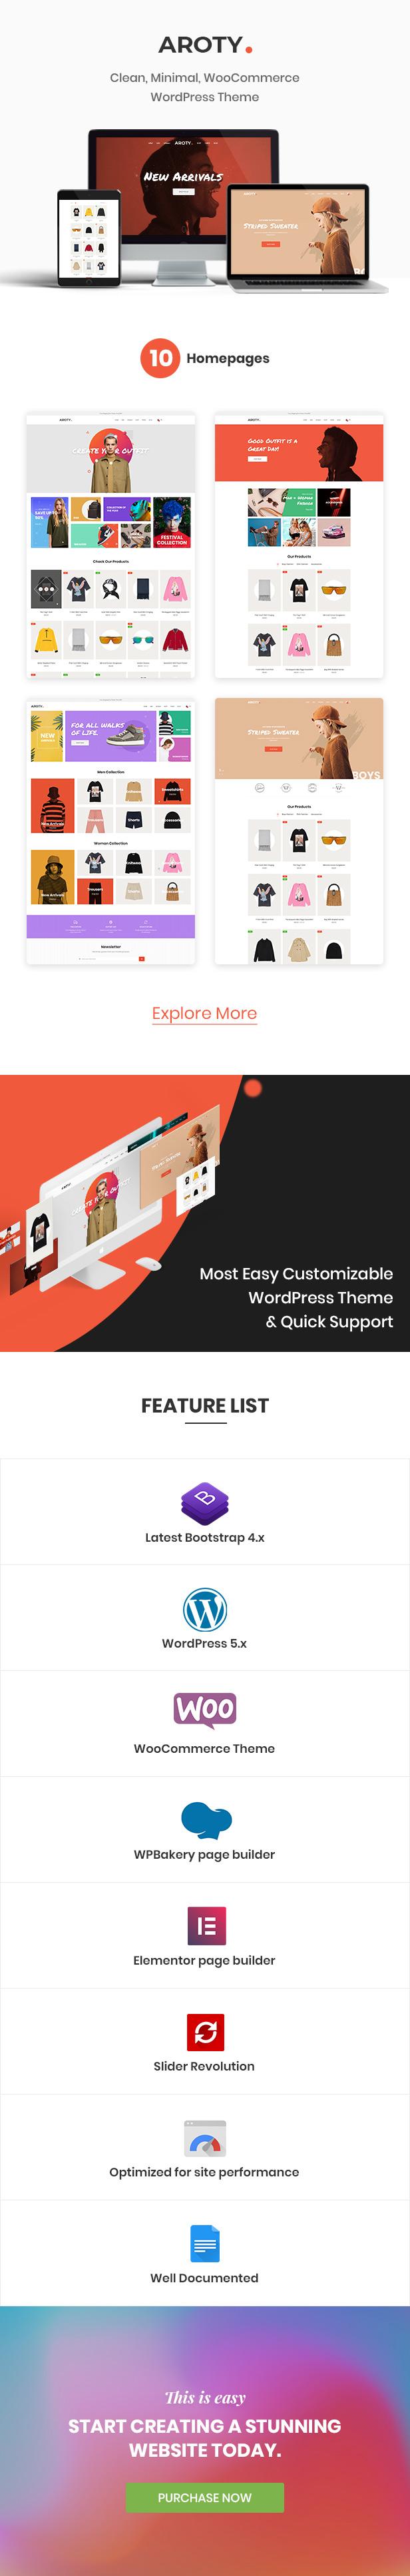 Aroty - Clean, Minimal Shop WordPress WooCommerce Theme - 1